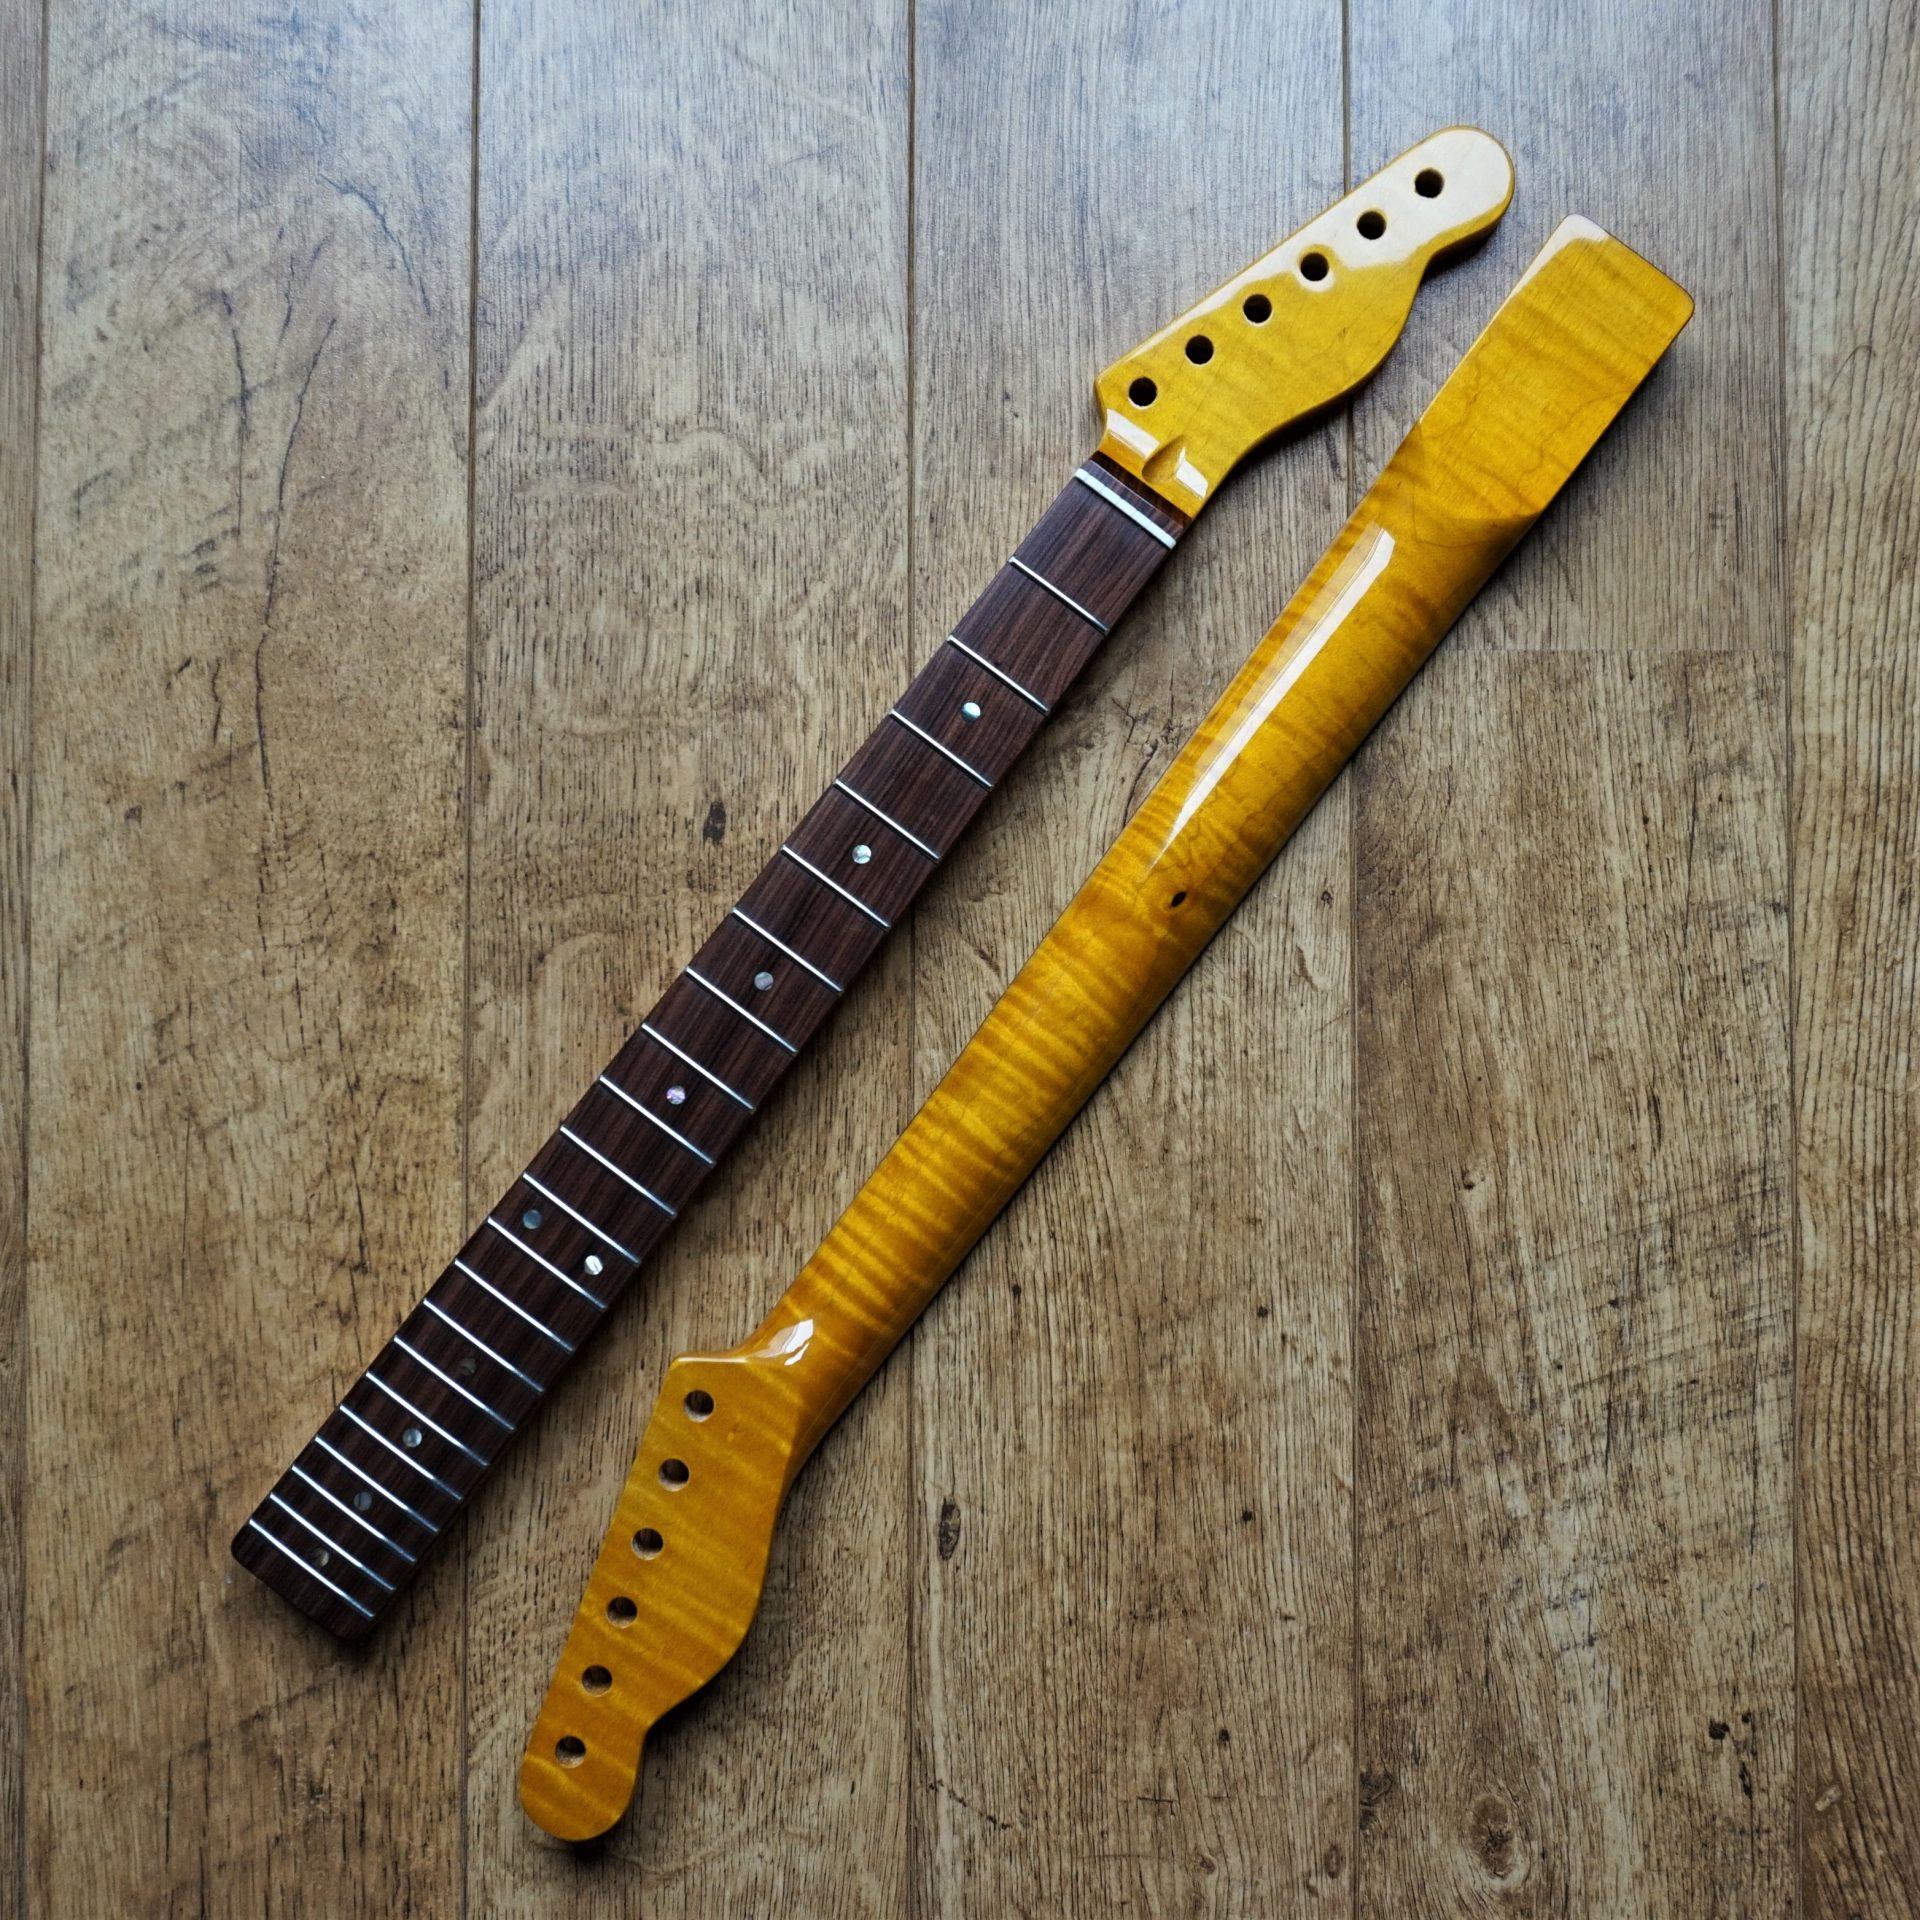 telecaster kabukalli and flame maple guitar neck abalone guitar anatomy. Black Bedroom Furniture Sets. Home Design Ideas